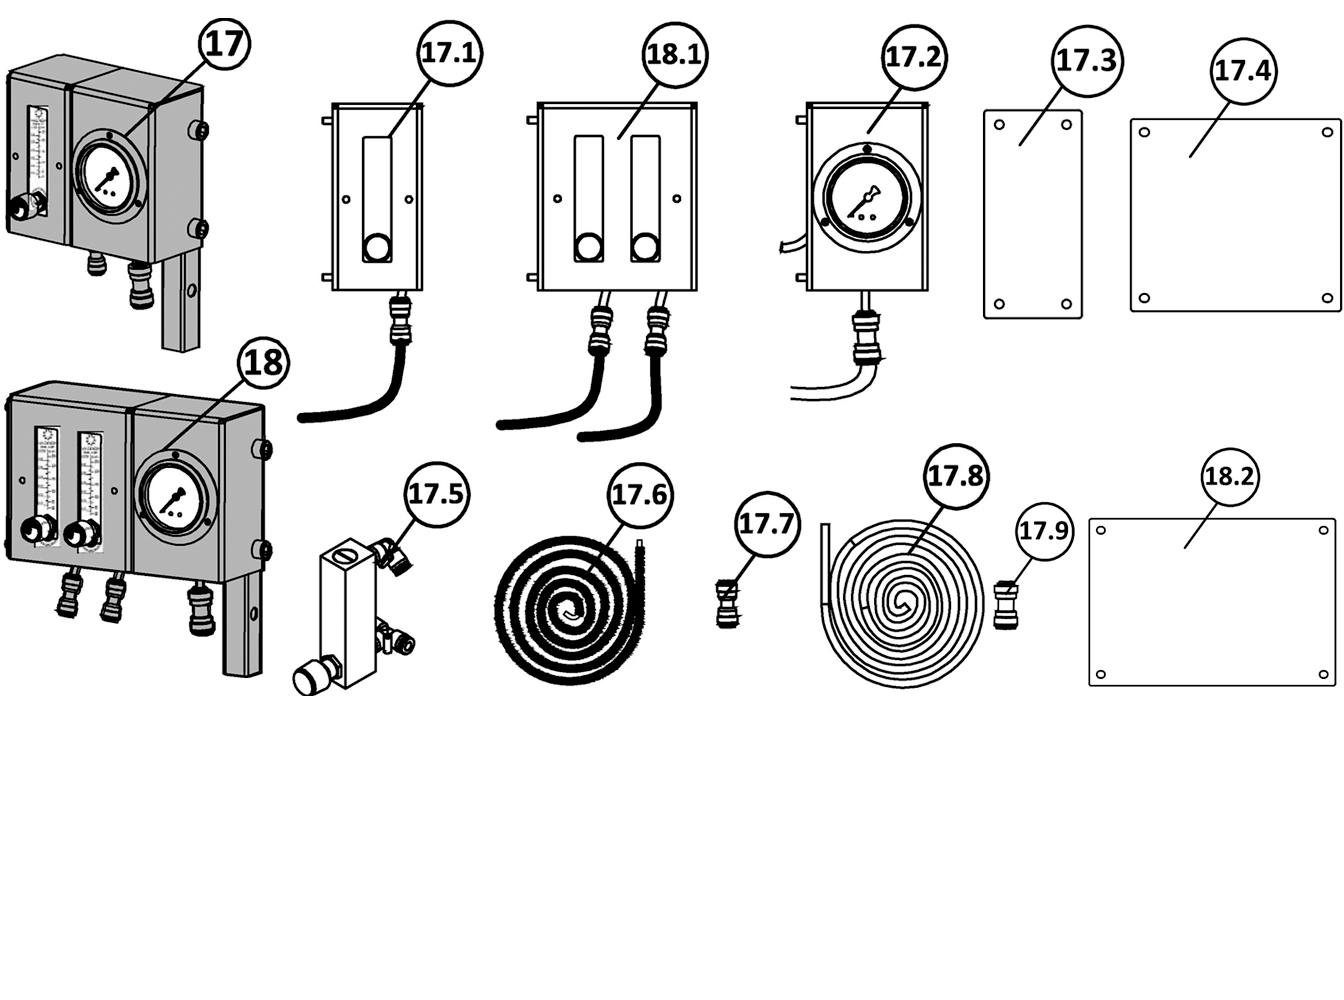 rep-panel-de-control - image #2